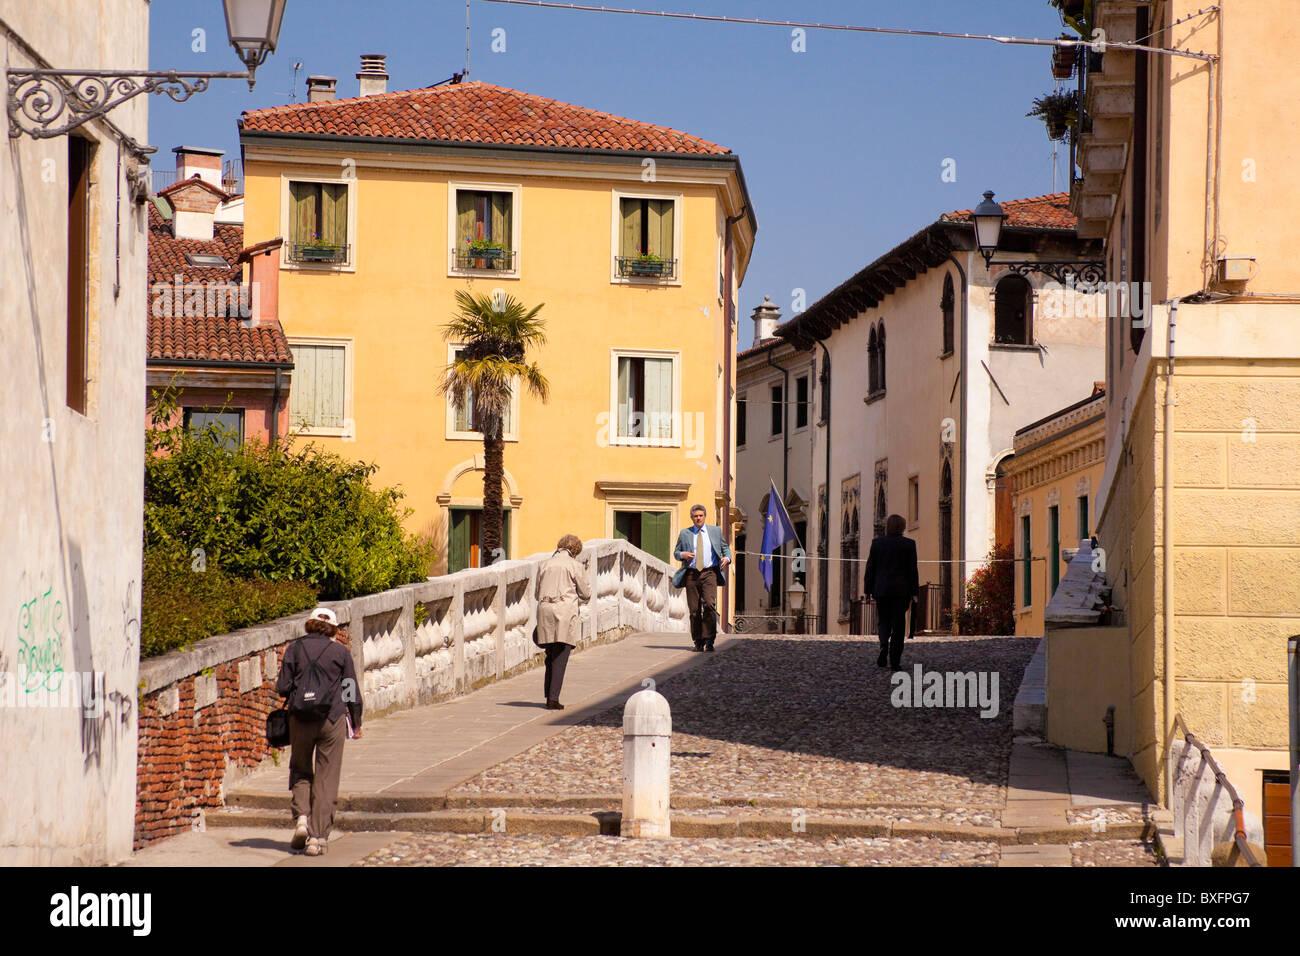 Back-street in town of Vicenza, Veneto Italy - Stock Image